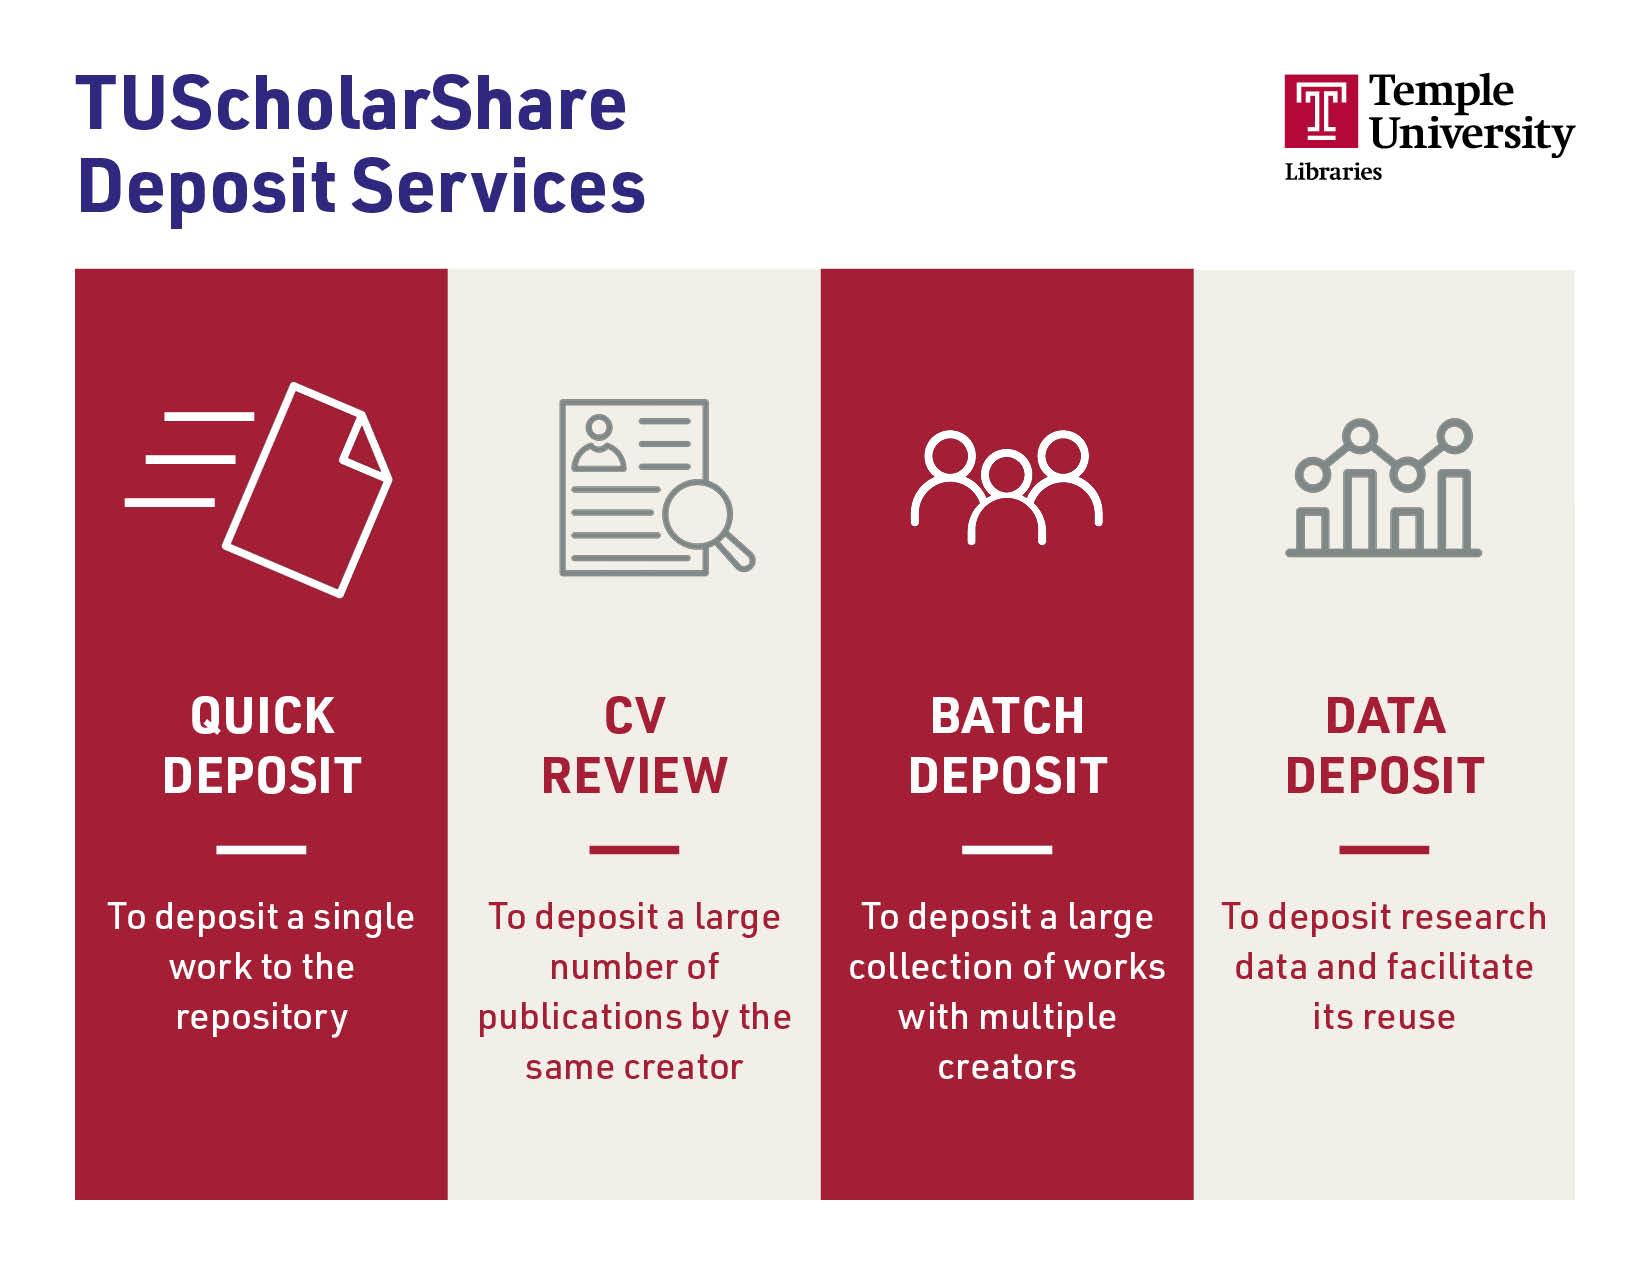 Scholarshare deposit services